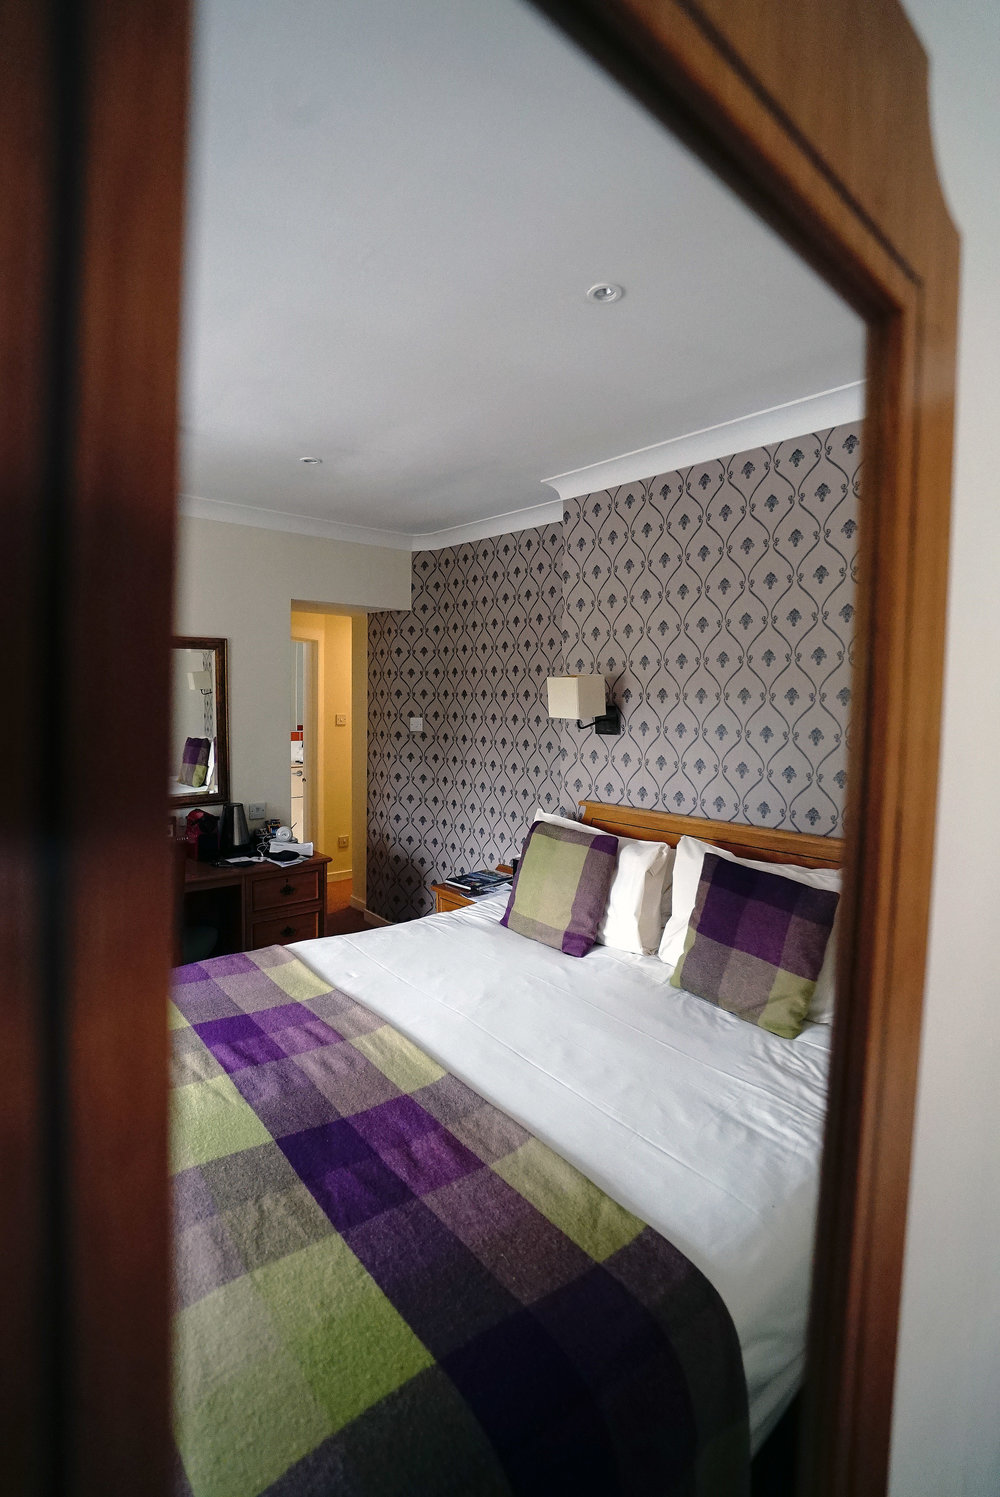 Mercure Peebles Bedroom Through Mirror.jpg